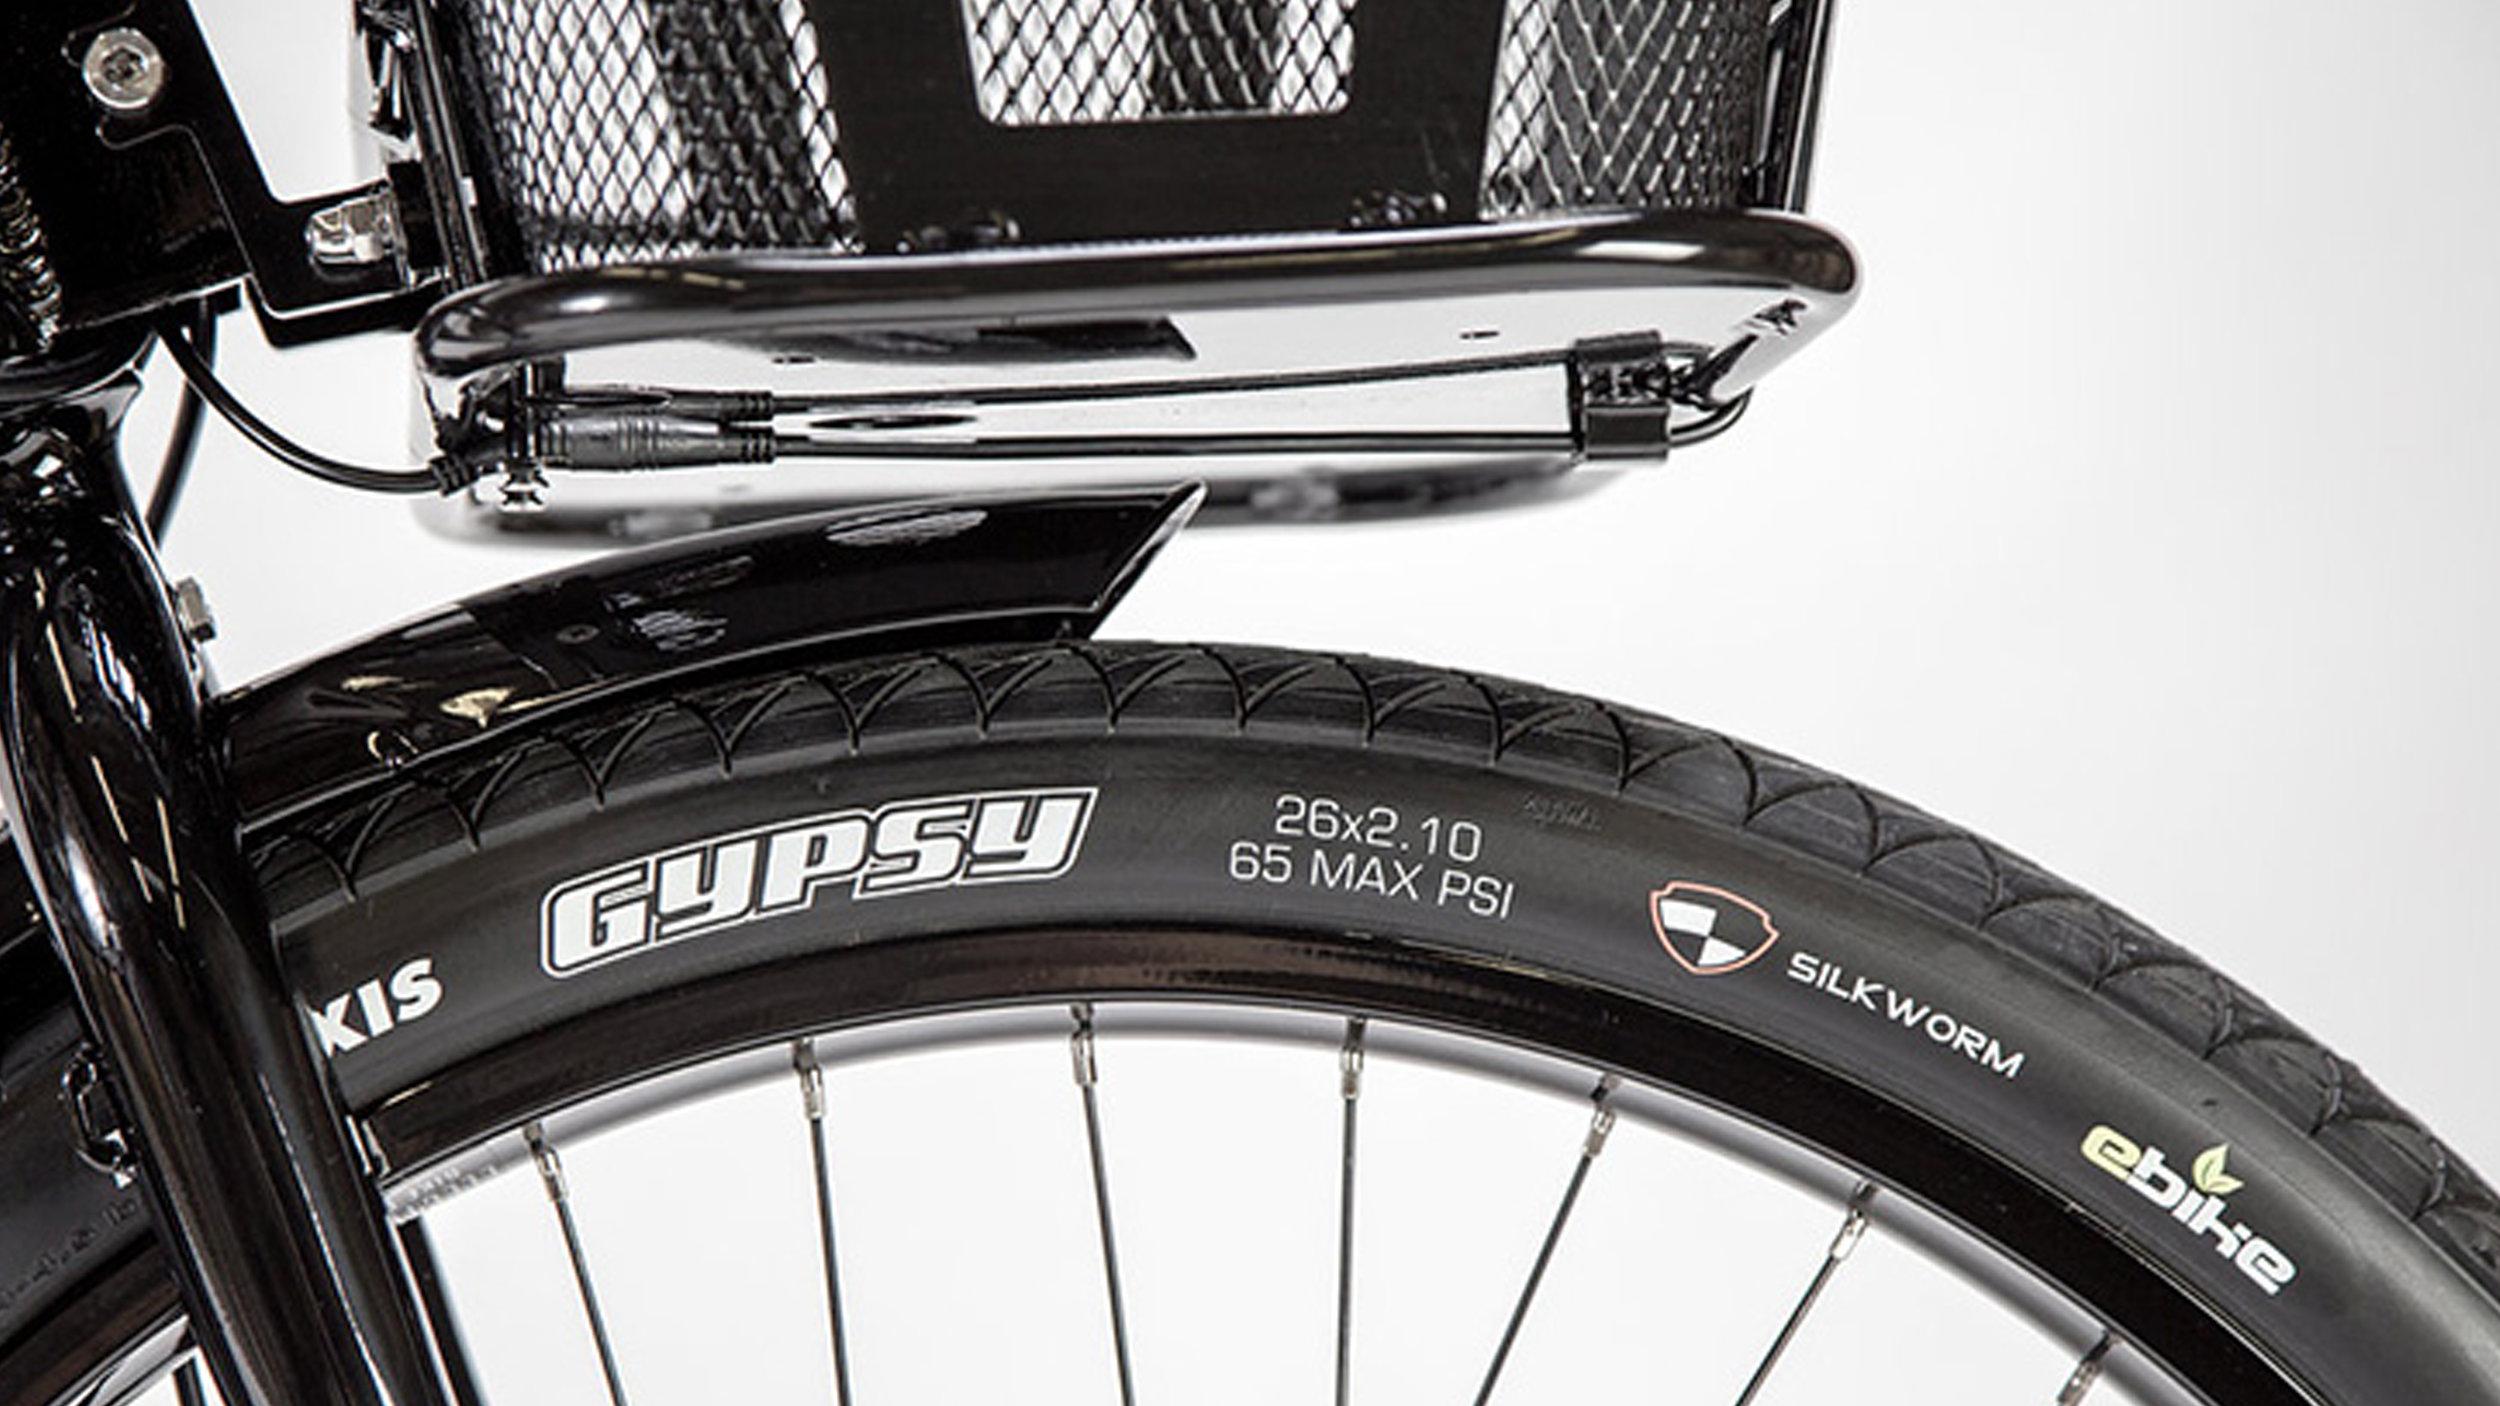 electrified-reviews-electric-bike-company-model-c-electric-bike-review-fenders.jpg